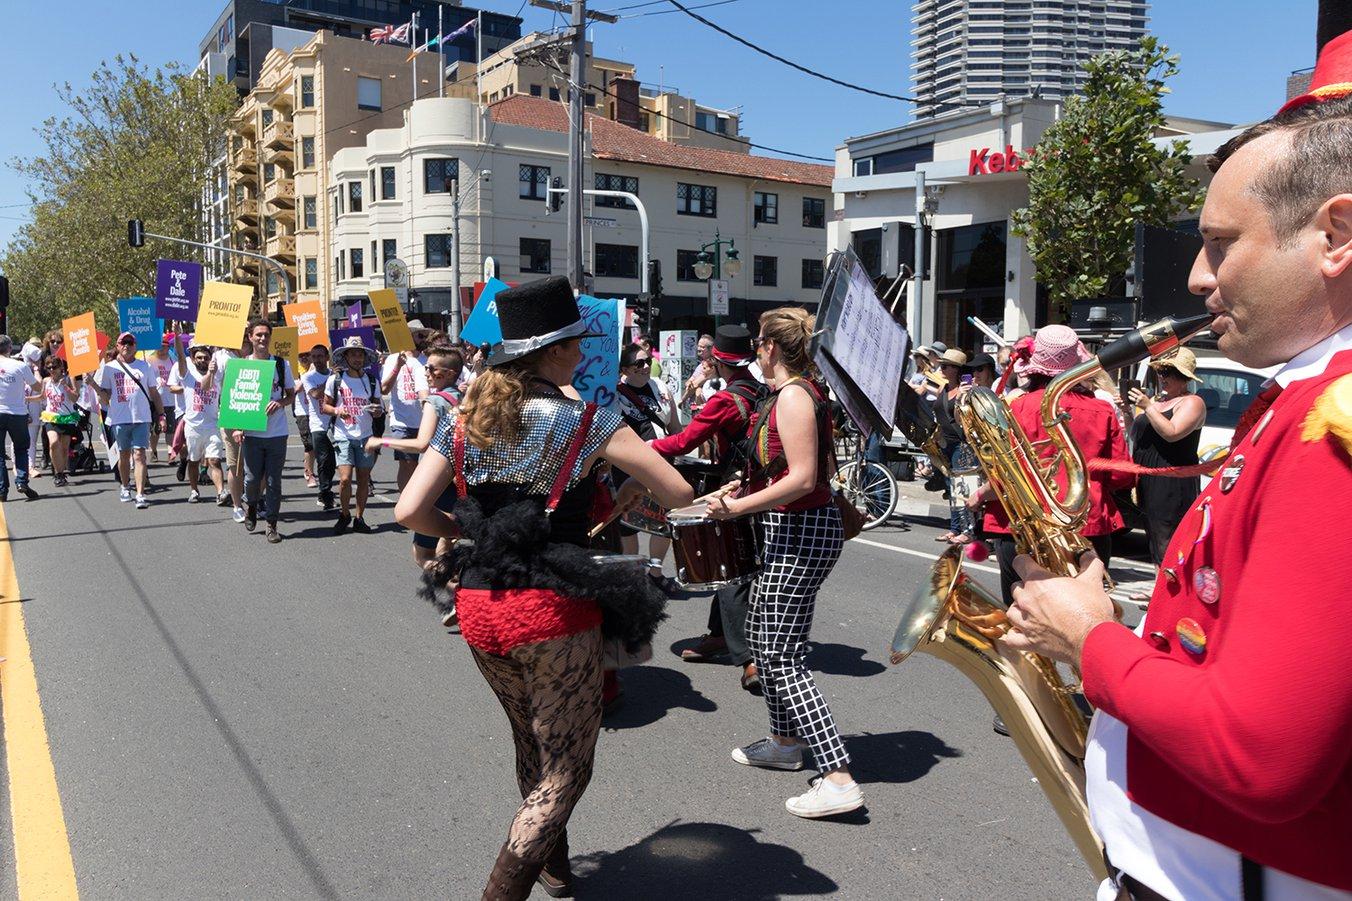 20170202_Pride March_Paul Rees_RE-SIZED_022.jpg